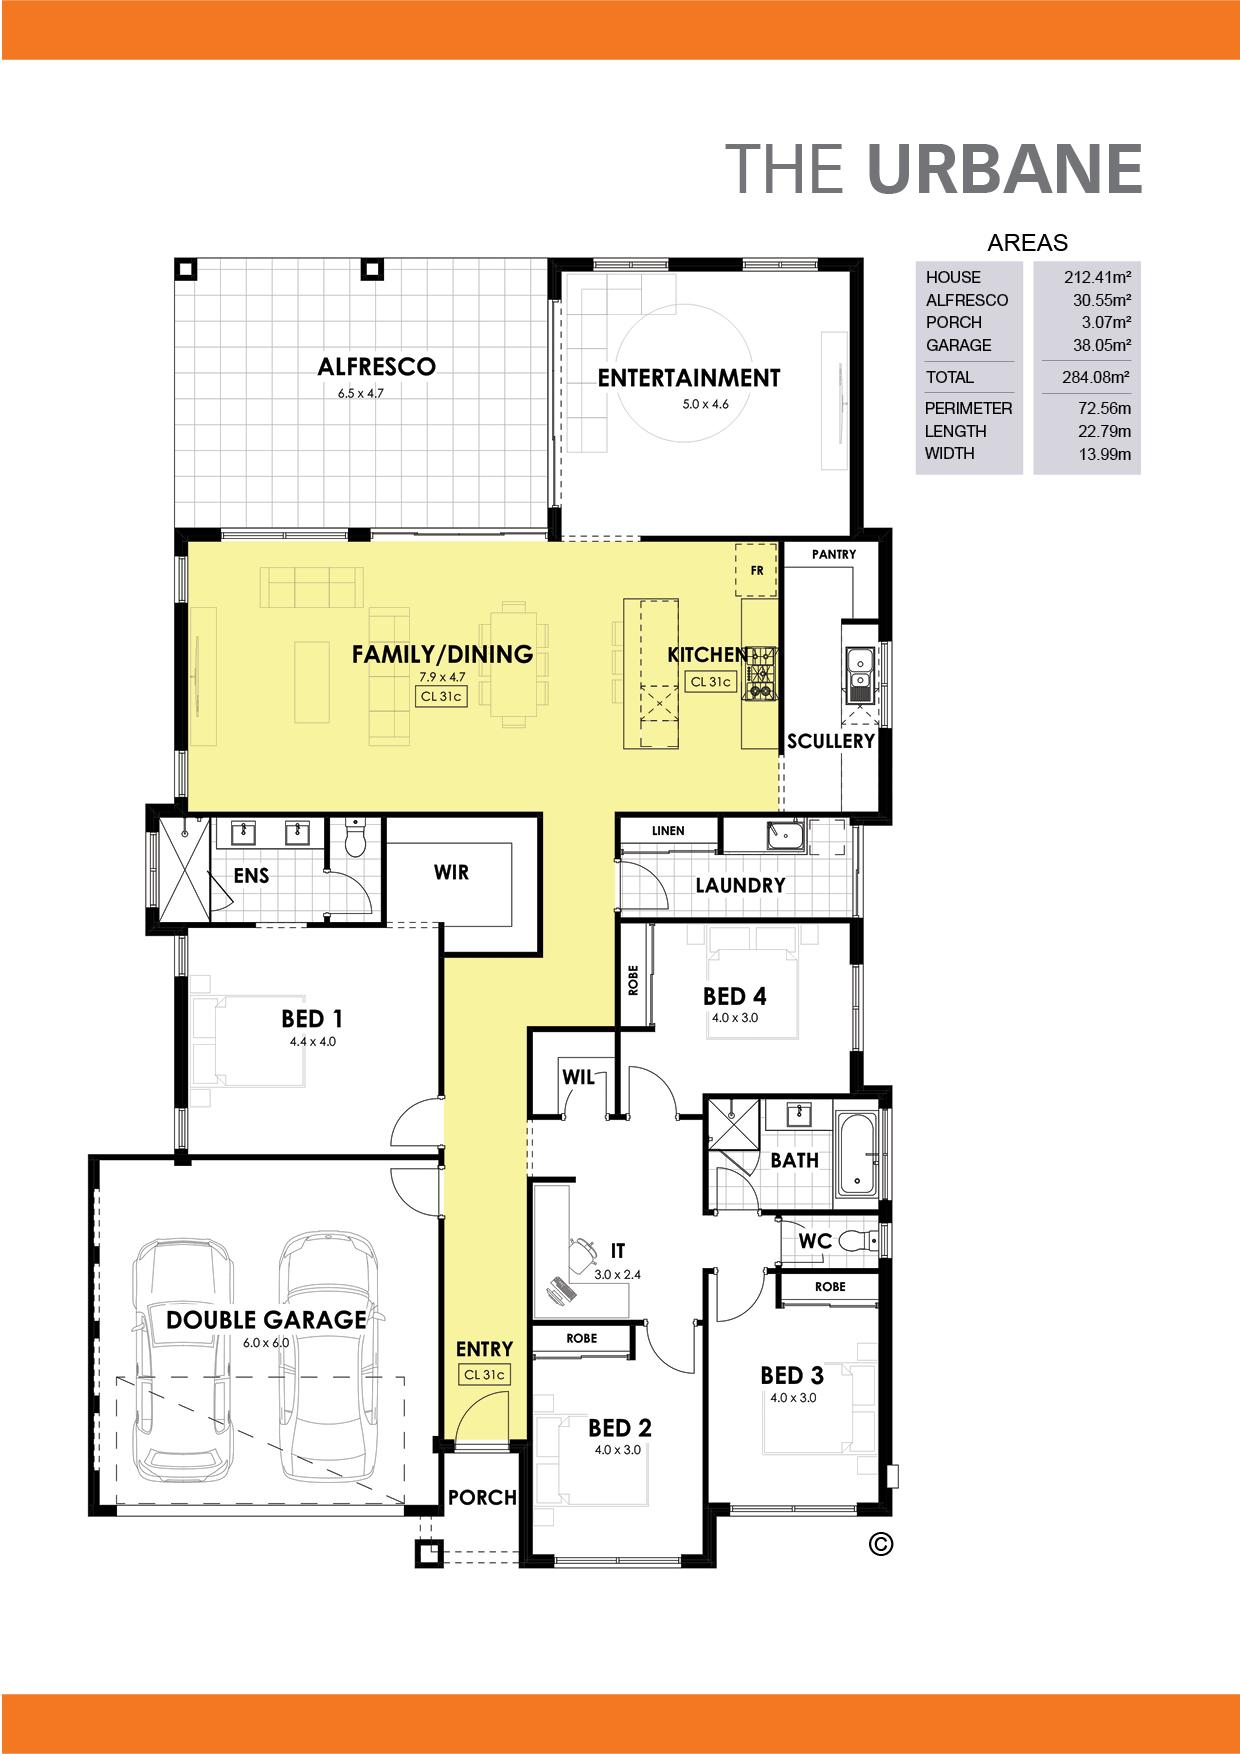 The Urbane Floorplan